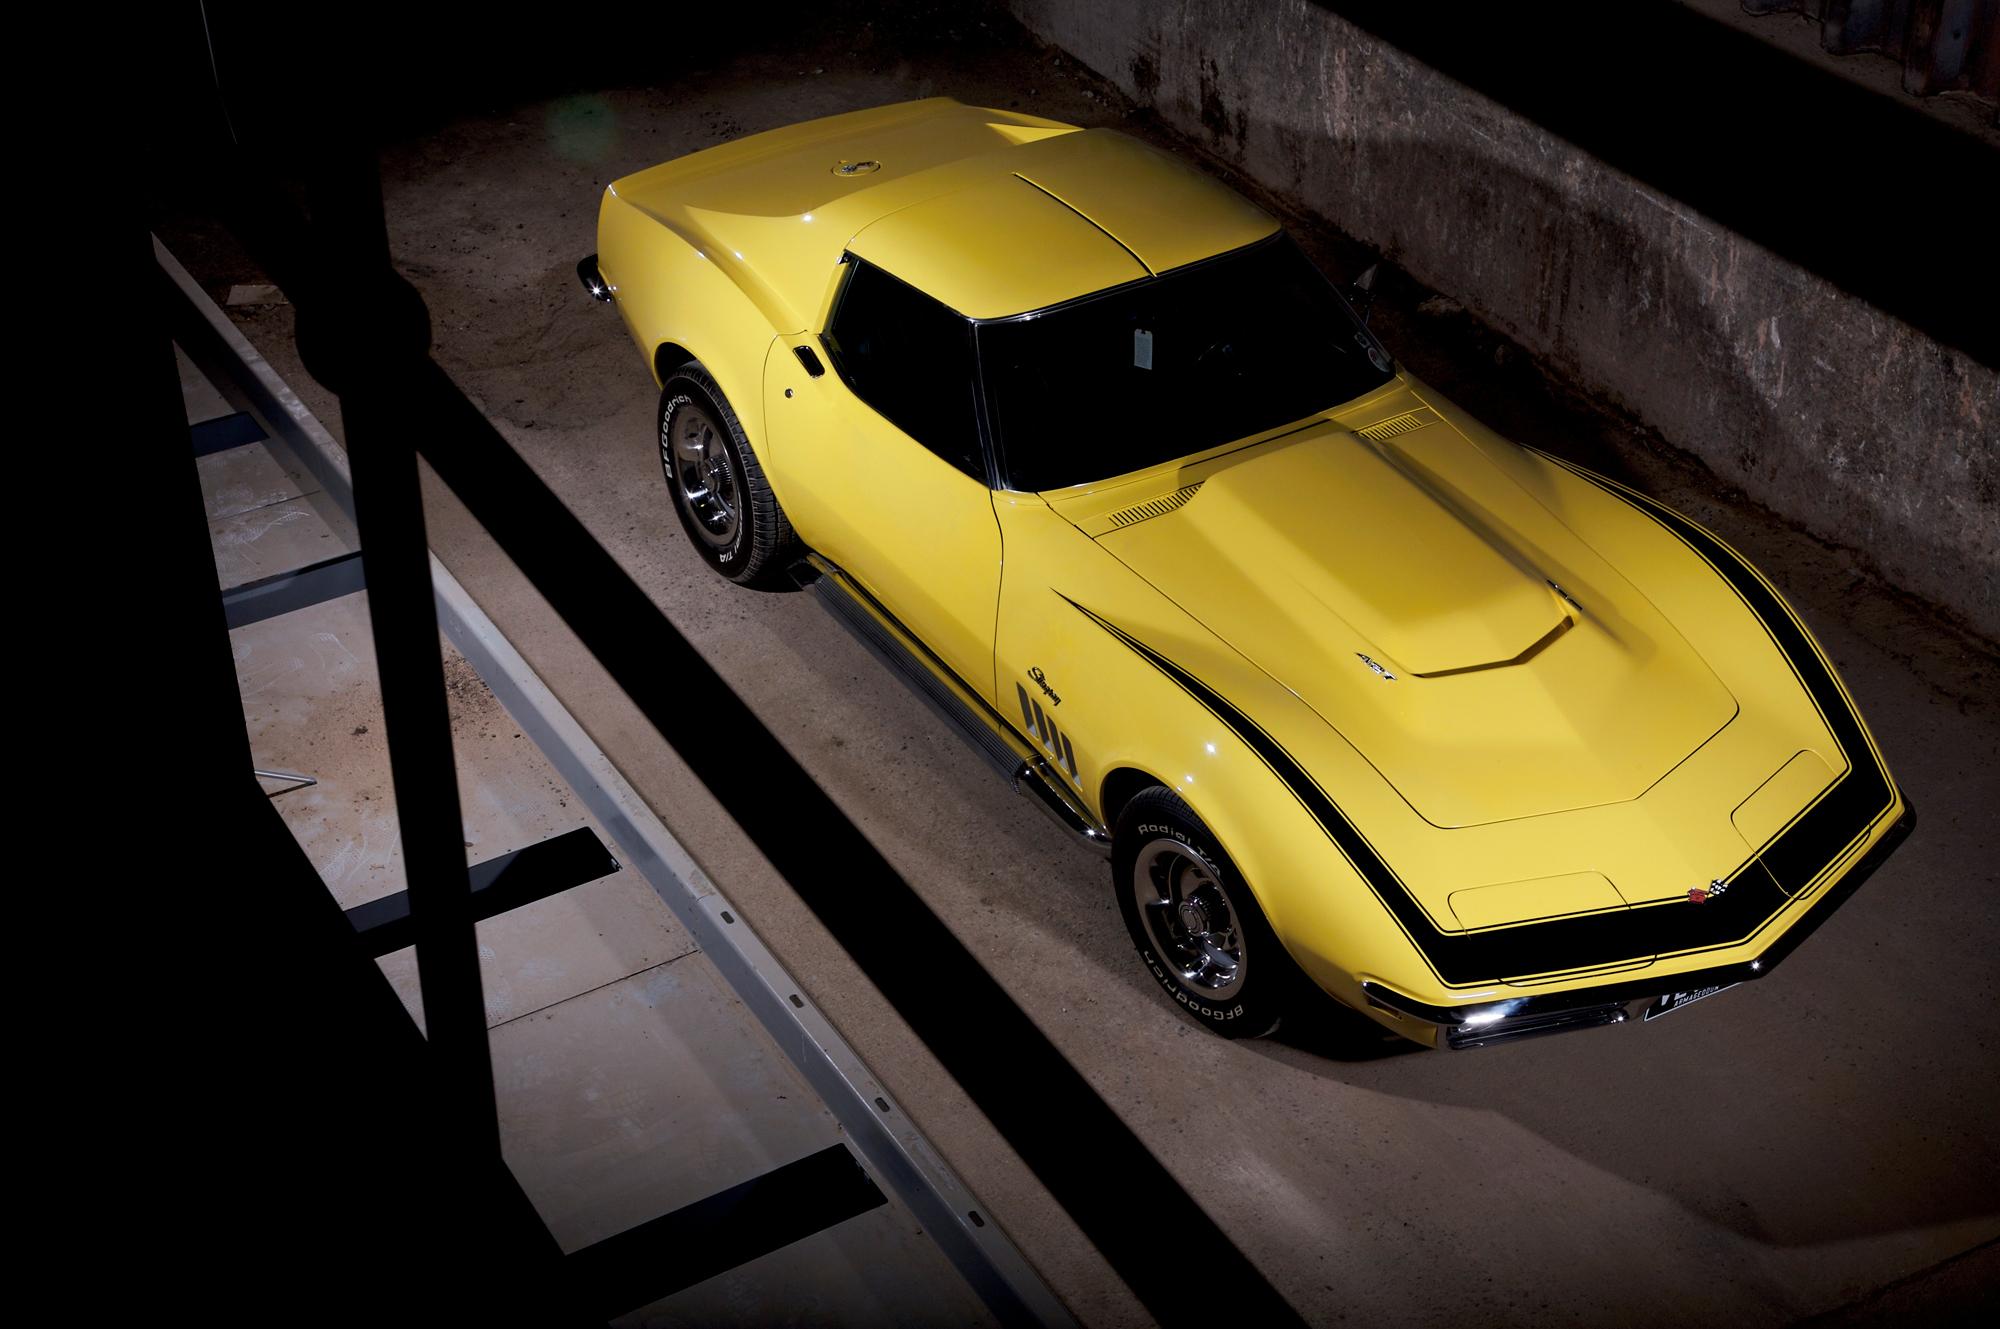 Classic 1969 Chevrolet Corvette Zl1 Reproduction For